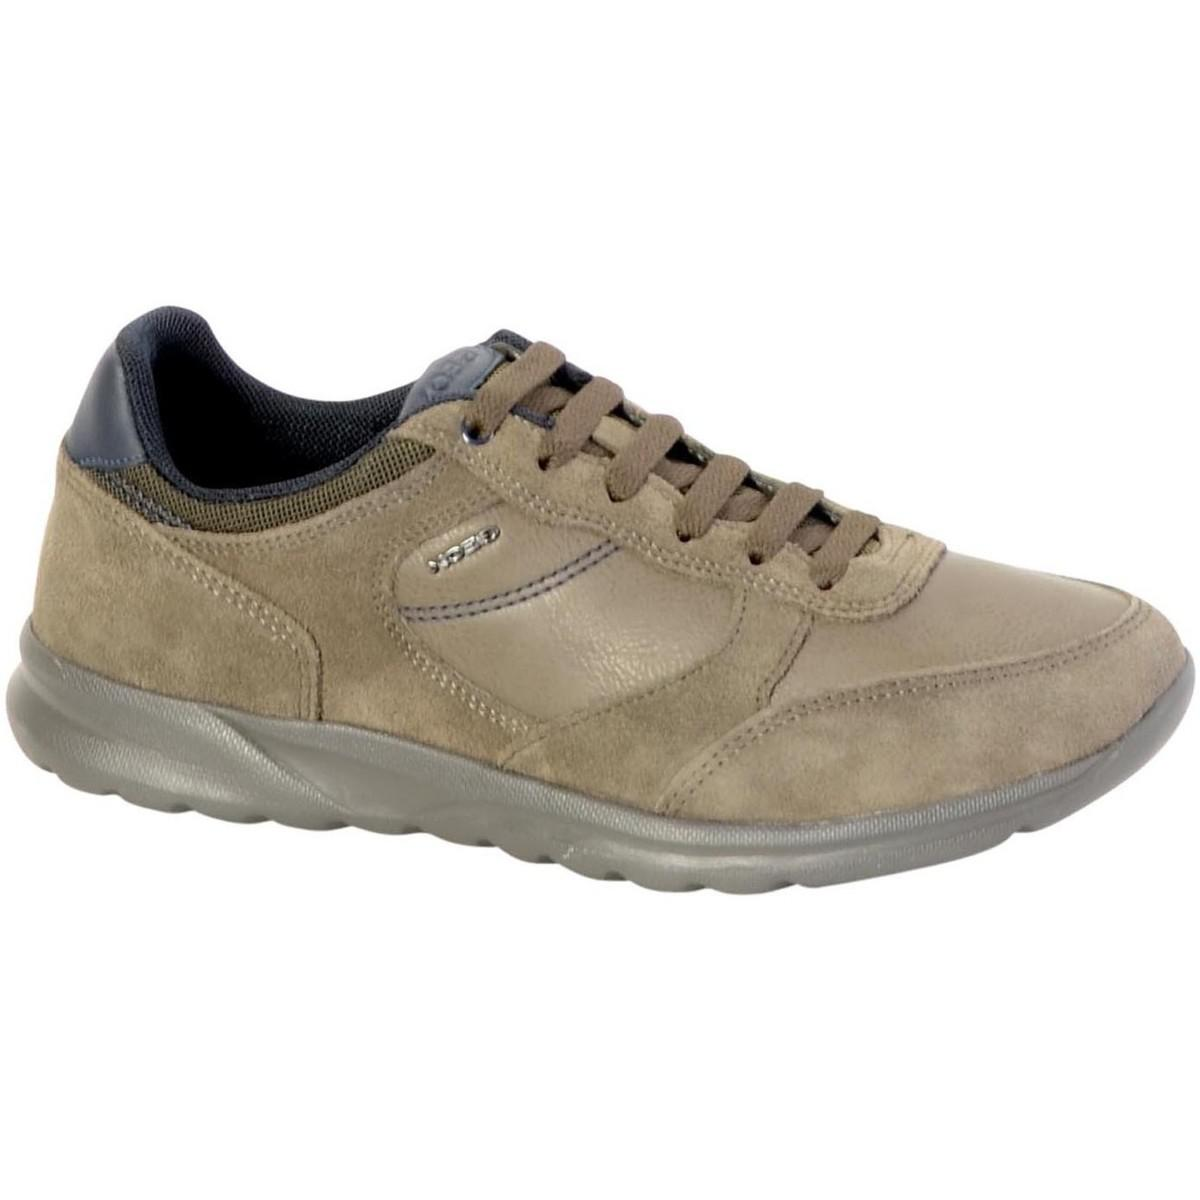 Geox Sneakerss U Damian A U740ha 022me C6029 Taupe Women's Shoes (trainers) In Brown